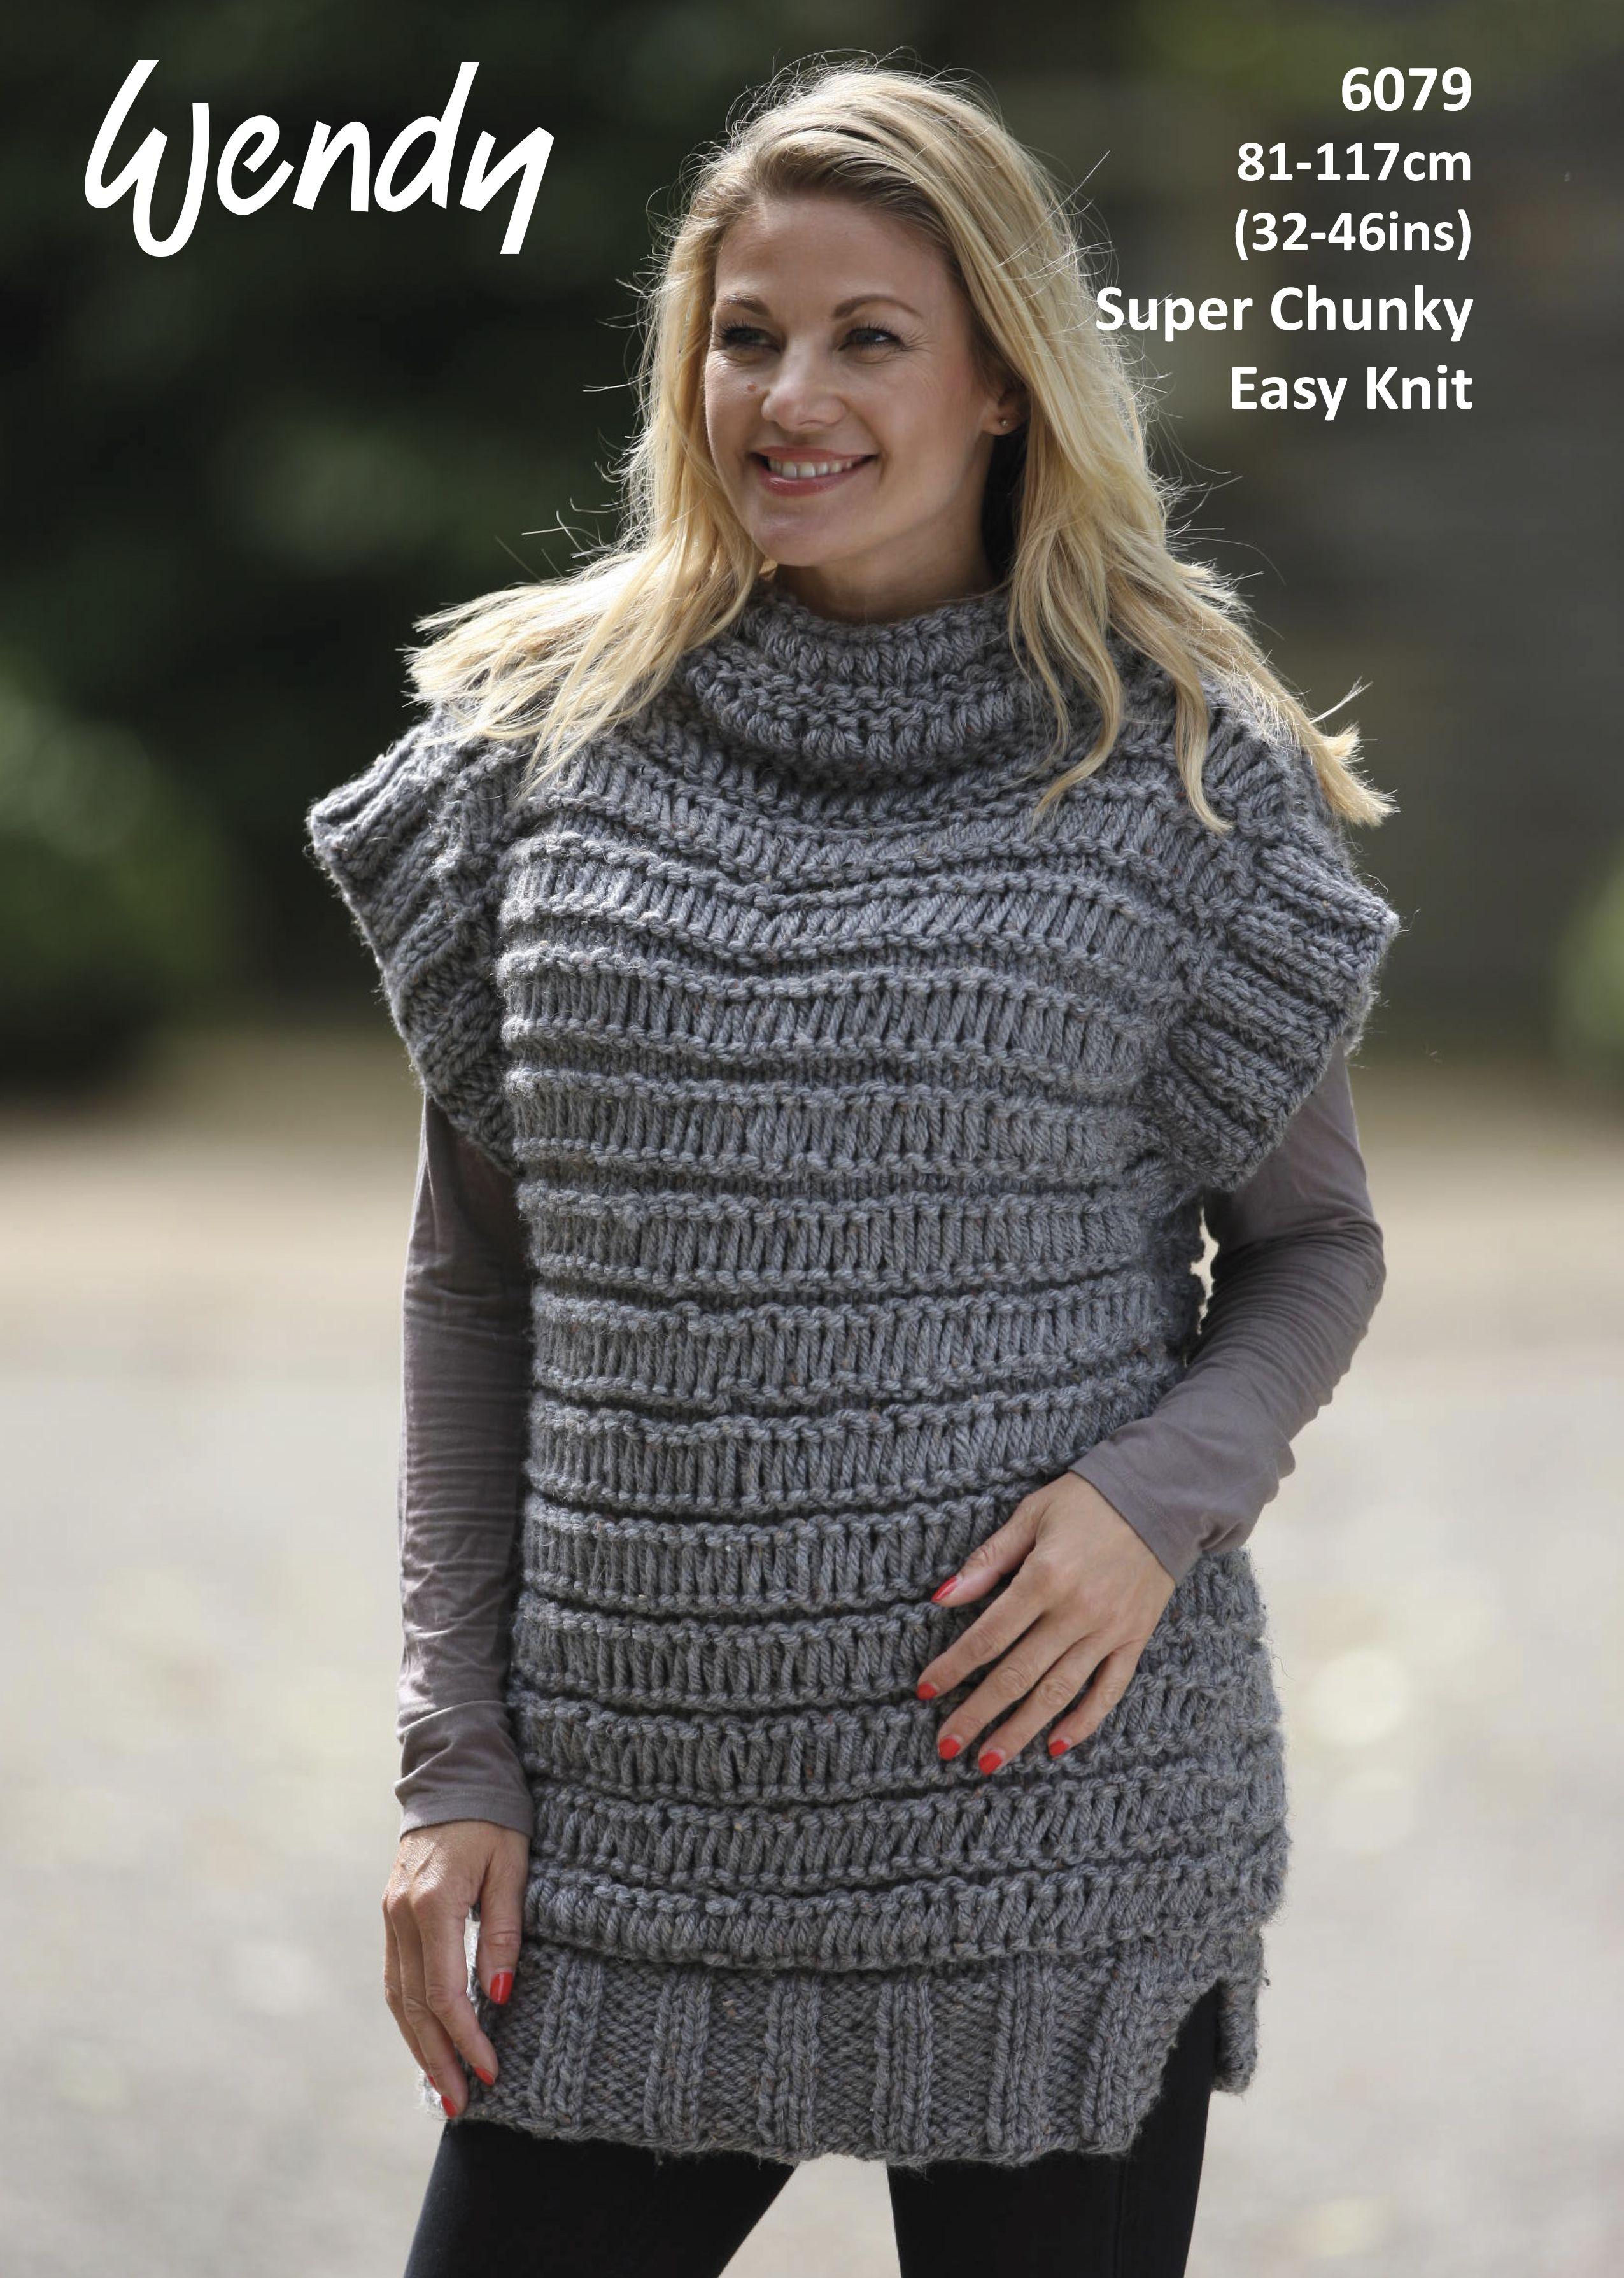 bd3e11c223bf Easy Knit Sleeveless Jumper in Wendy Harris Super Chunky - Leaflet ...